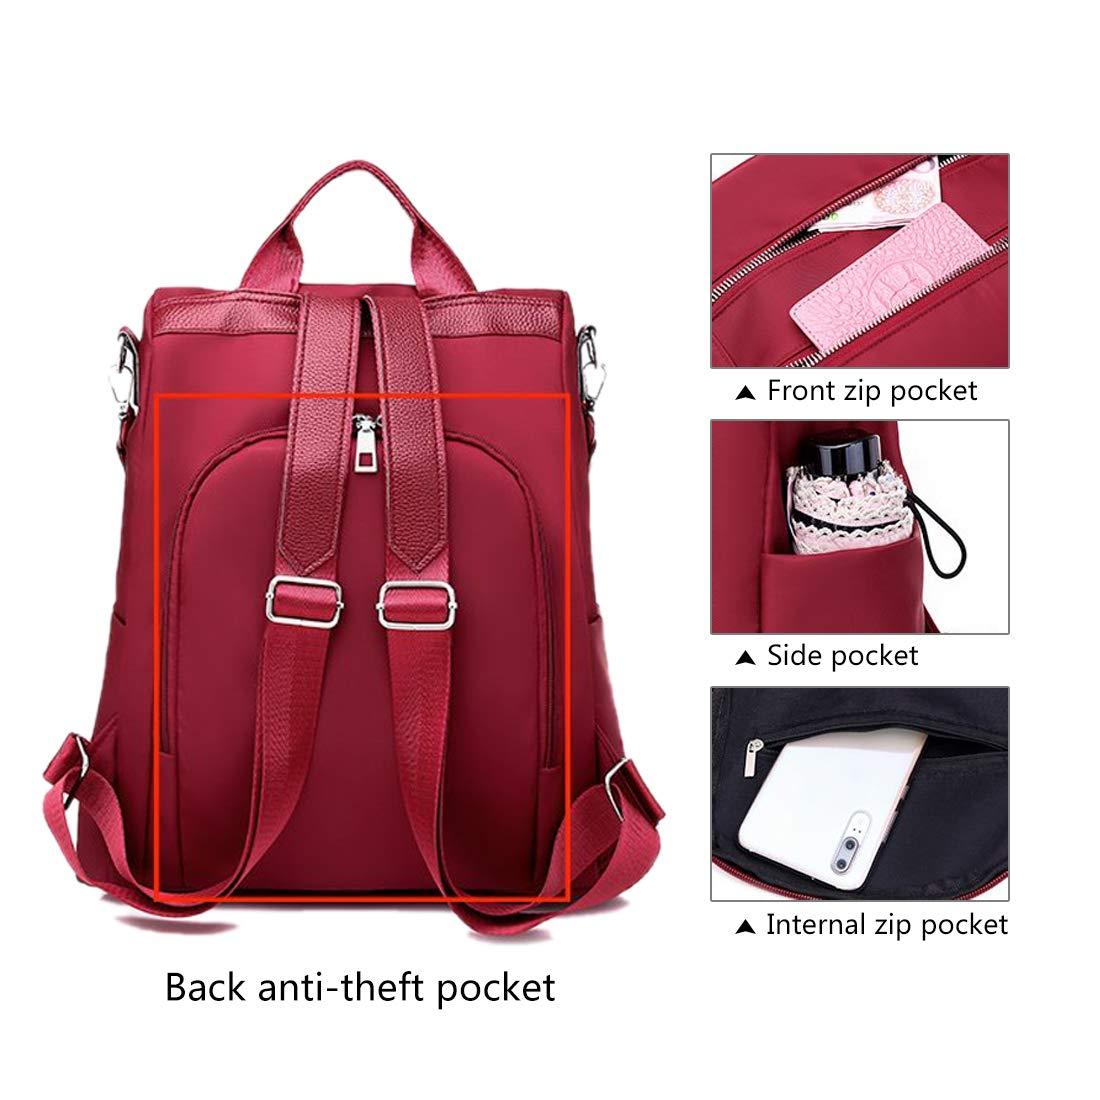 Women Backpack Purse Waterproof Nylon Anti-theft Rucksack Lightweight School Shoulder Bag Travel Daypack for Girls